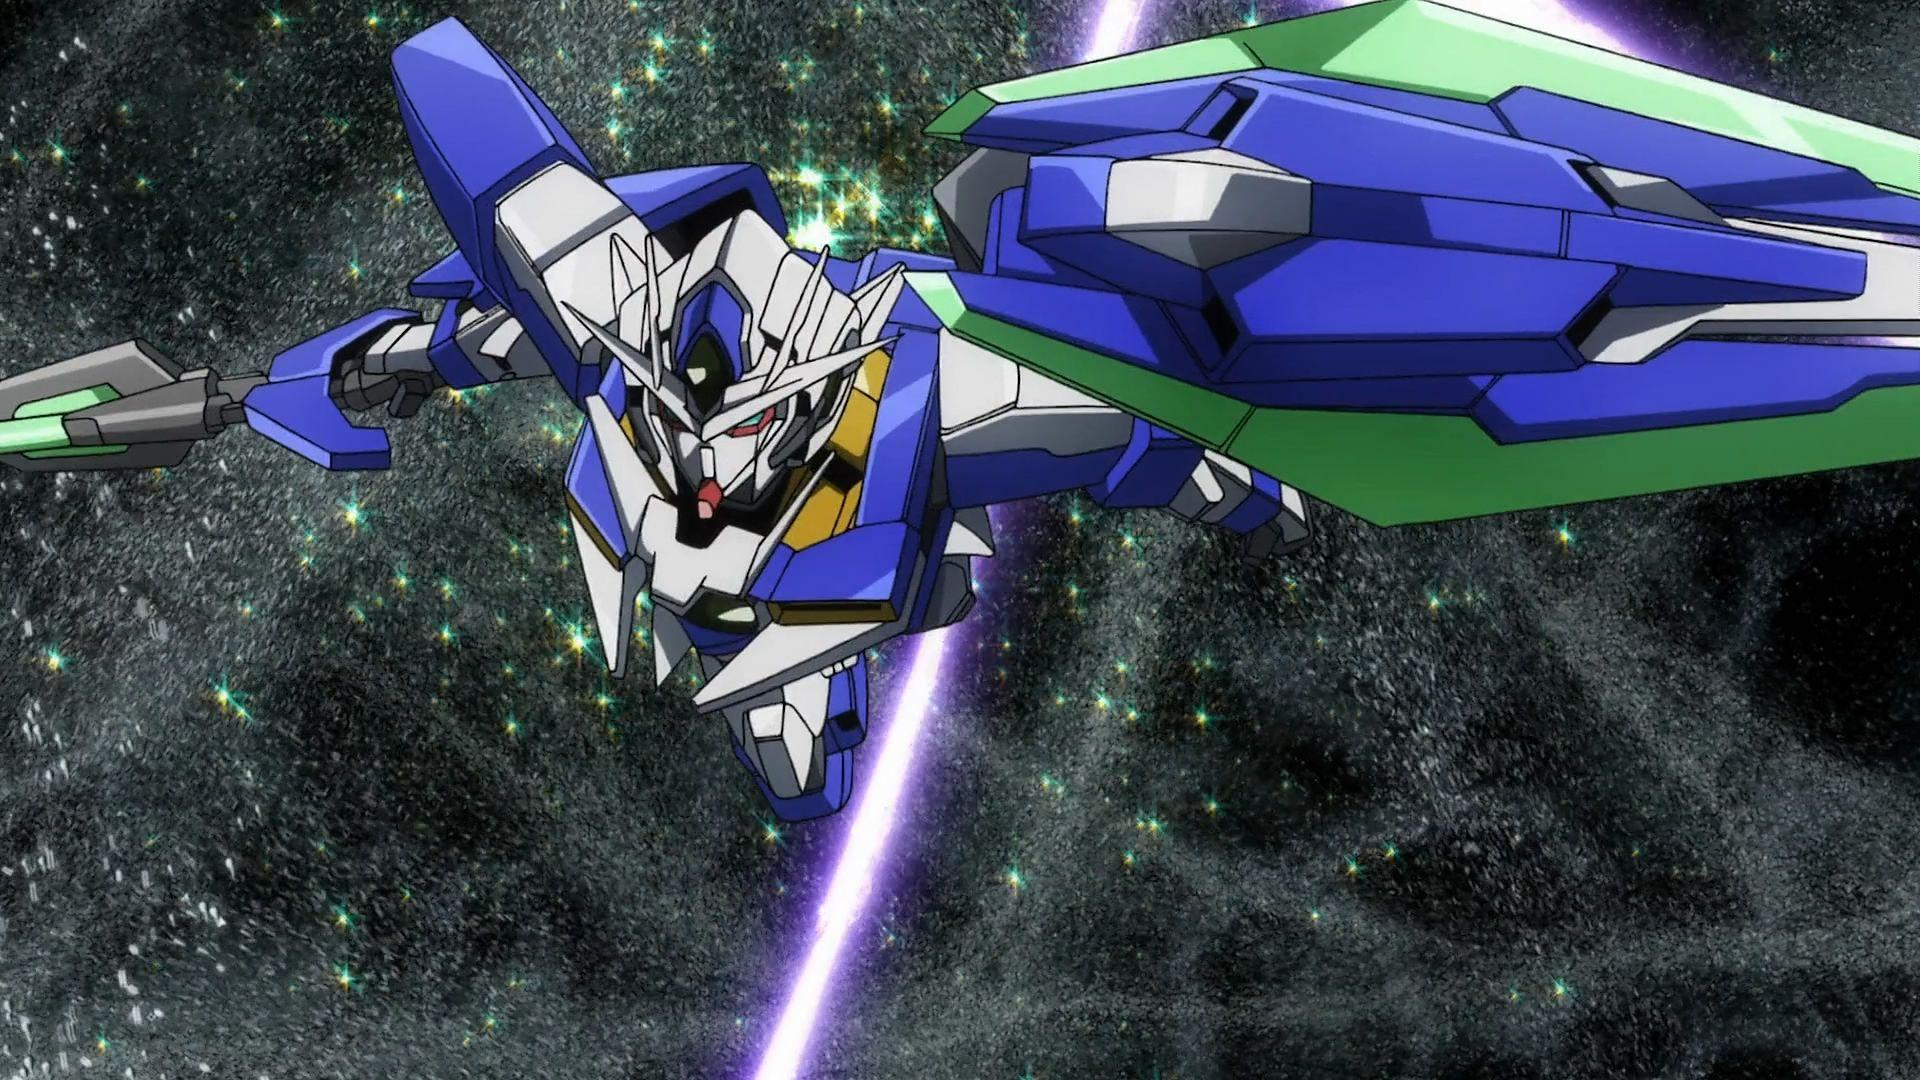 Pin By Navya Lyles On My Anime Characters Board Pinterest Gundam Bandai 1 144 Hgoo Gnt 0000 00 Qant Qanta Full Hd Wallpaper And Background Image